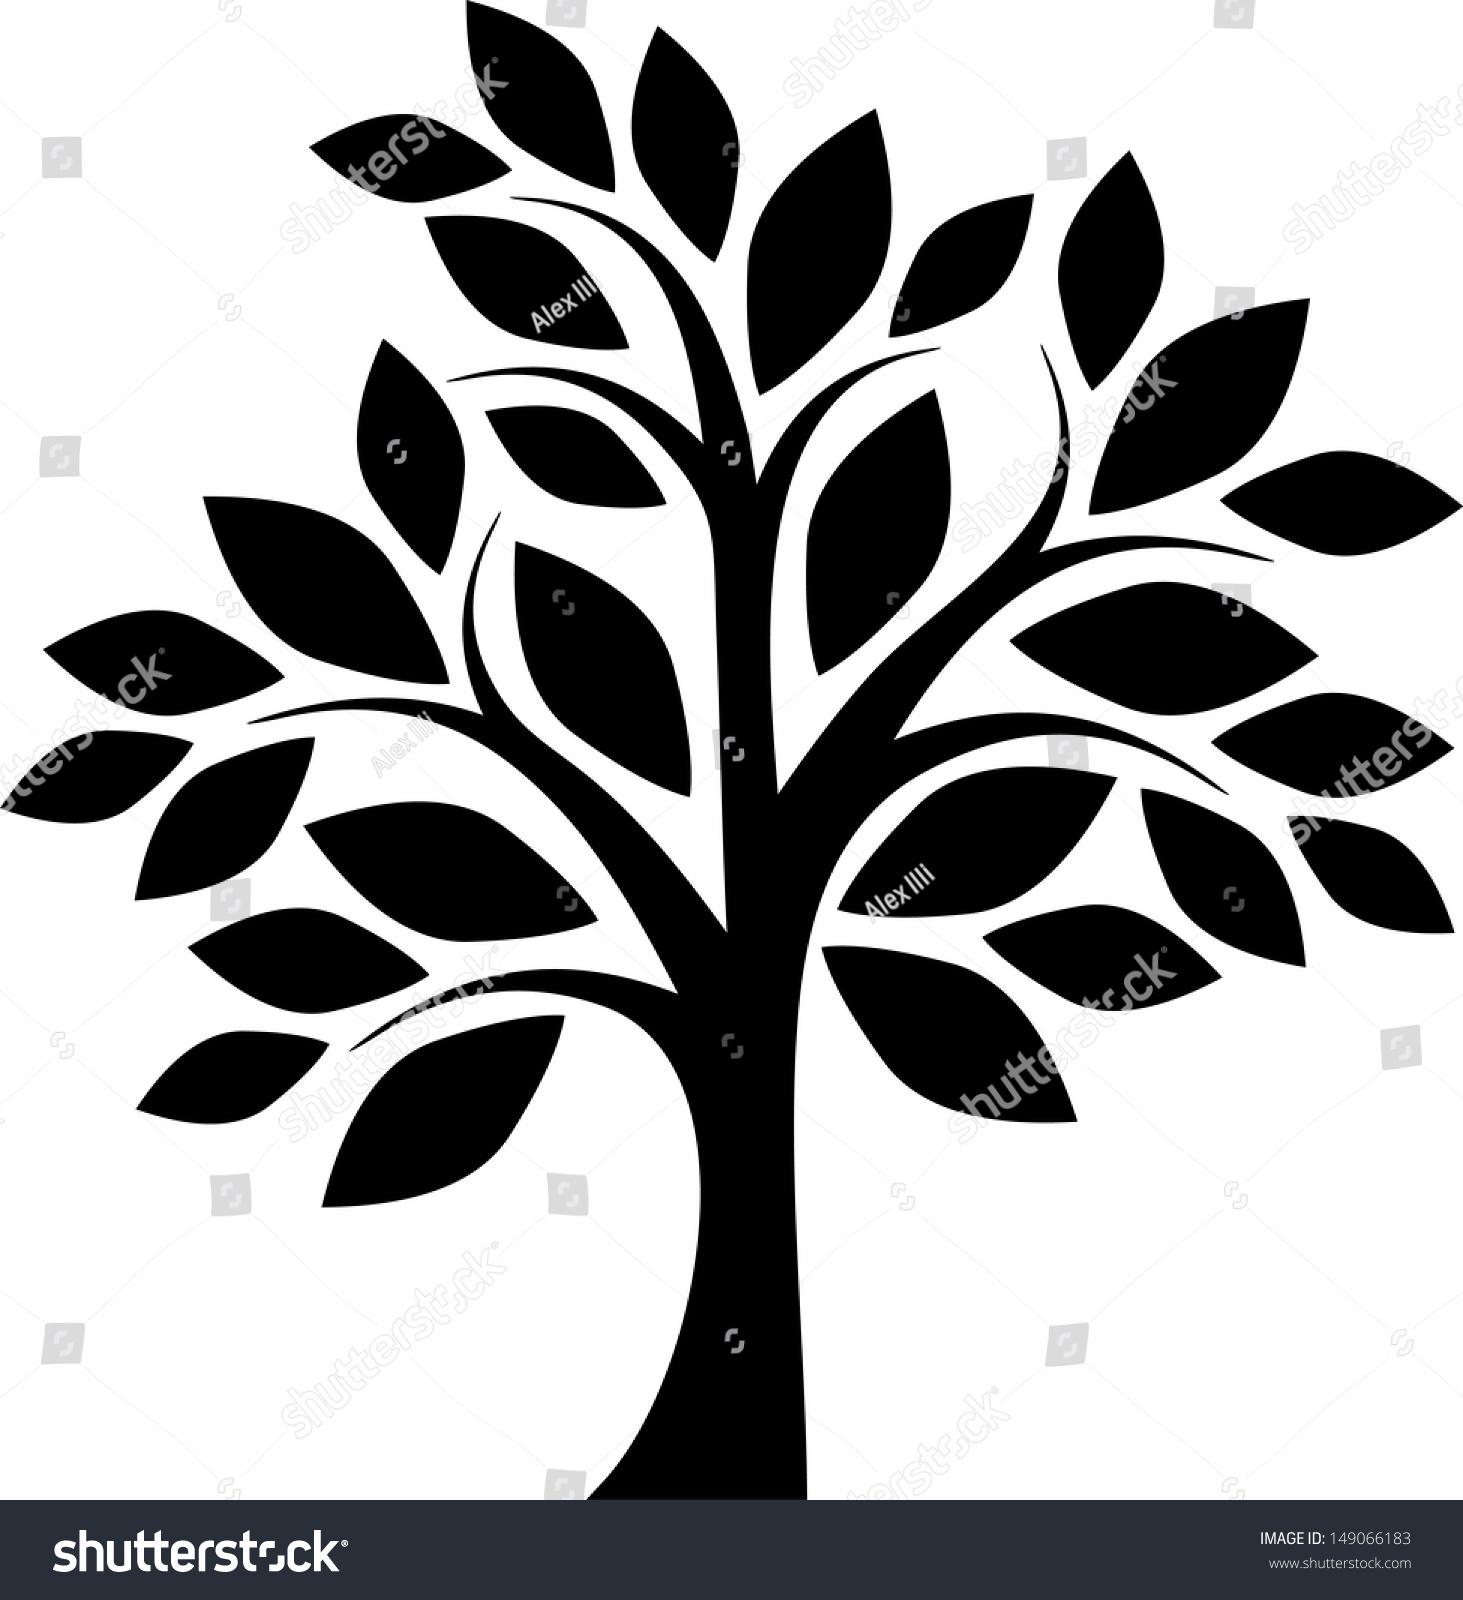 Decorative Simple Tree Stock Vector 149066183 - Shutterstock